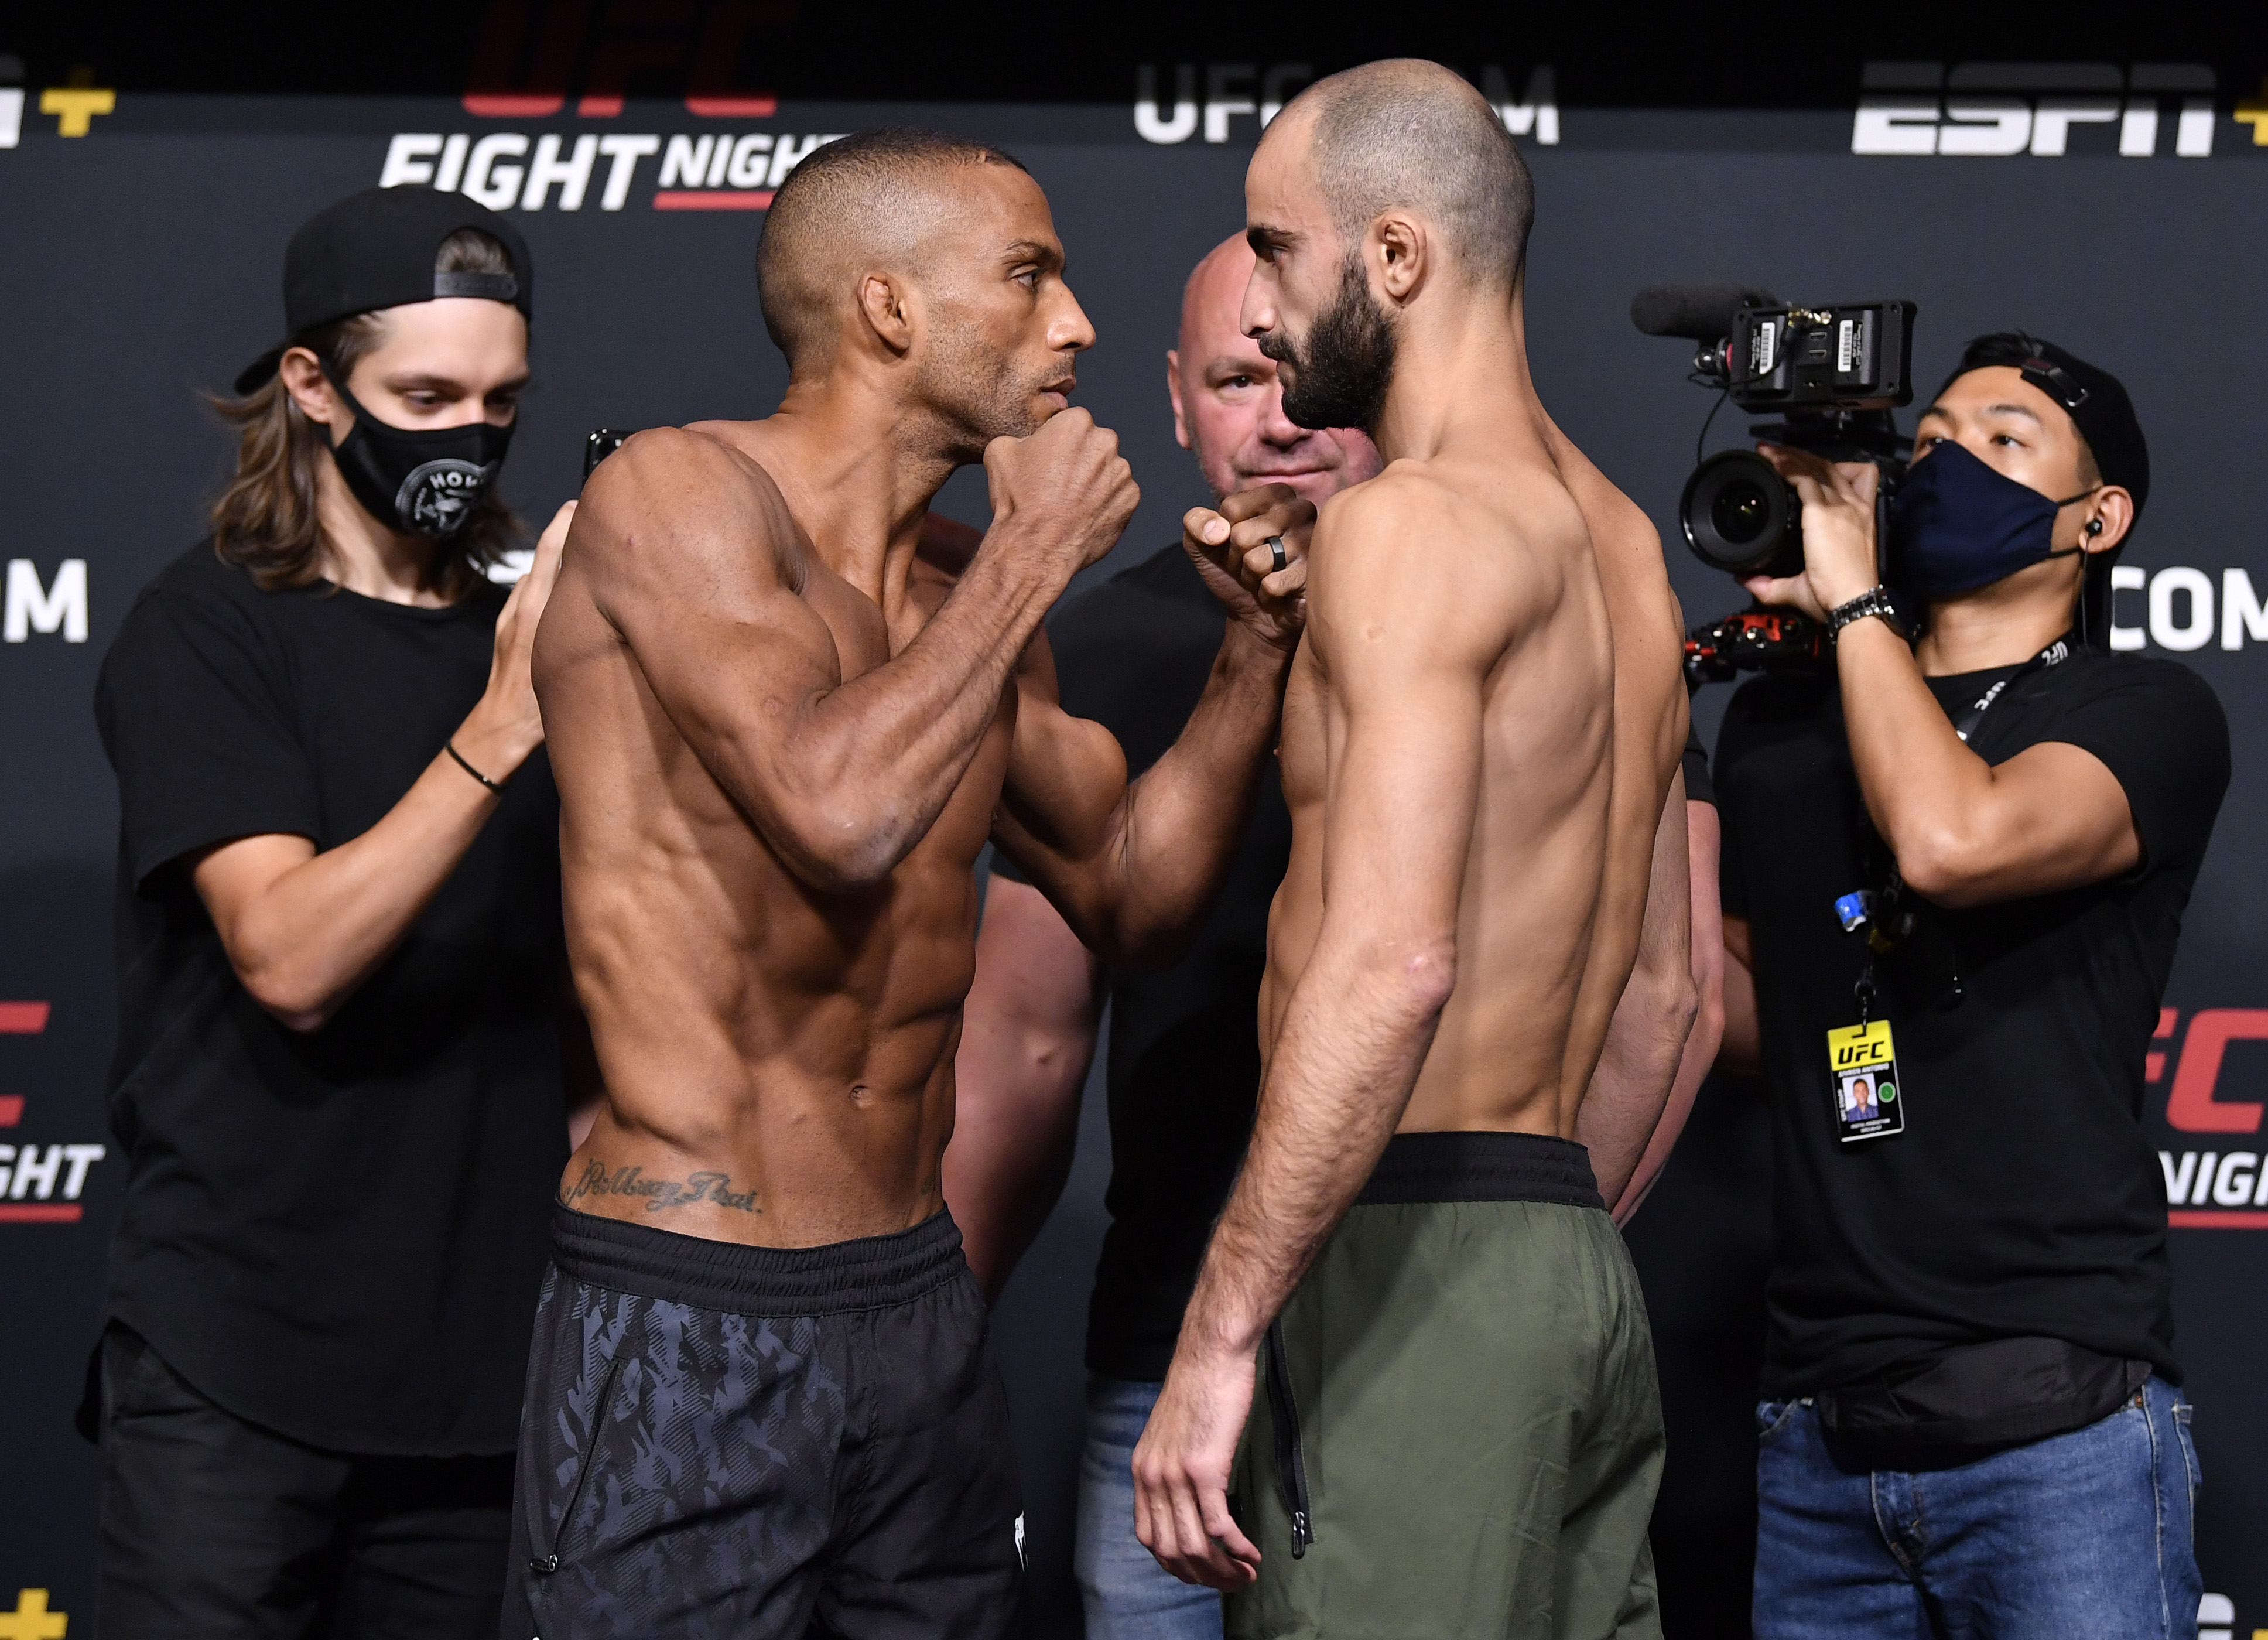 Edson Barboza flips to the betting favorite against Giga Chikadzefor the UFC Vegas 35 main event